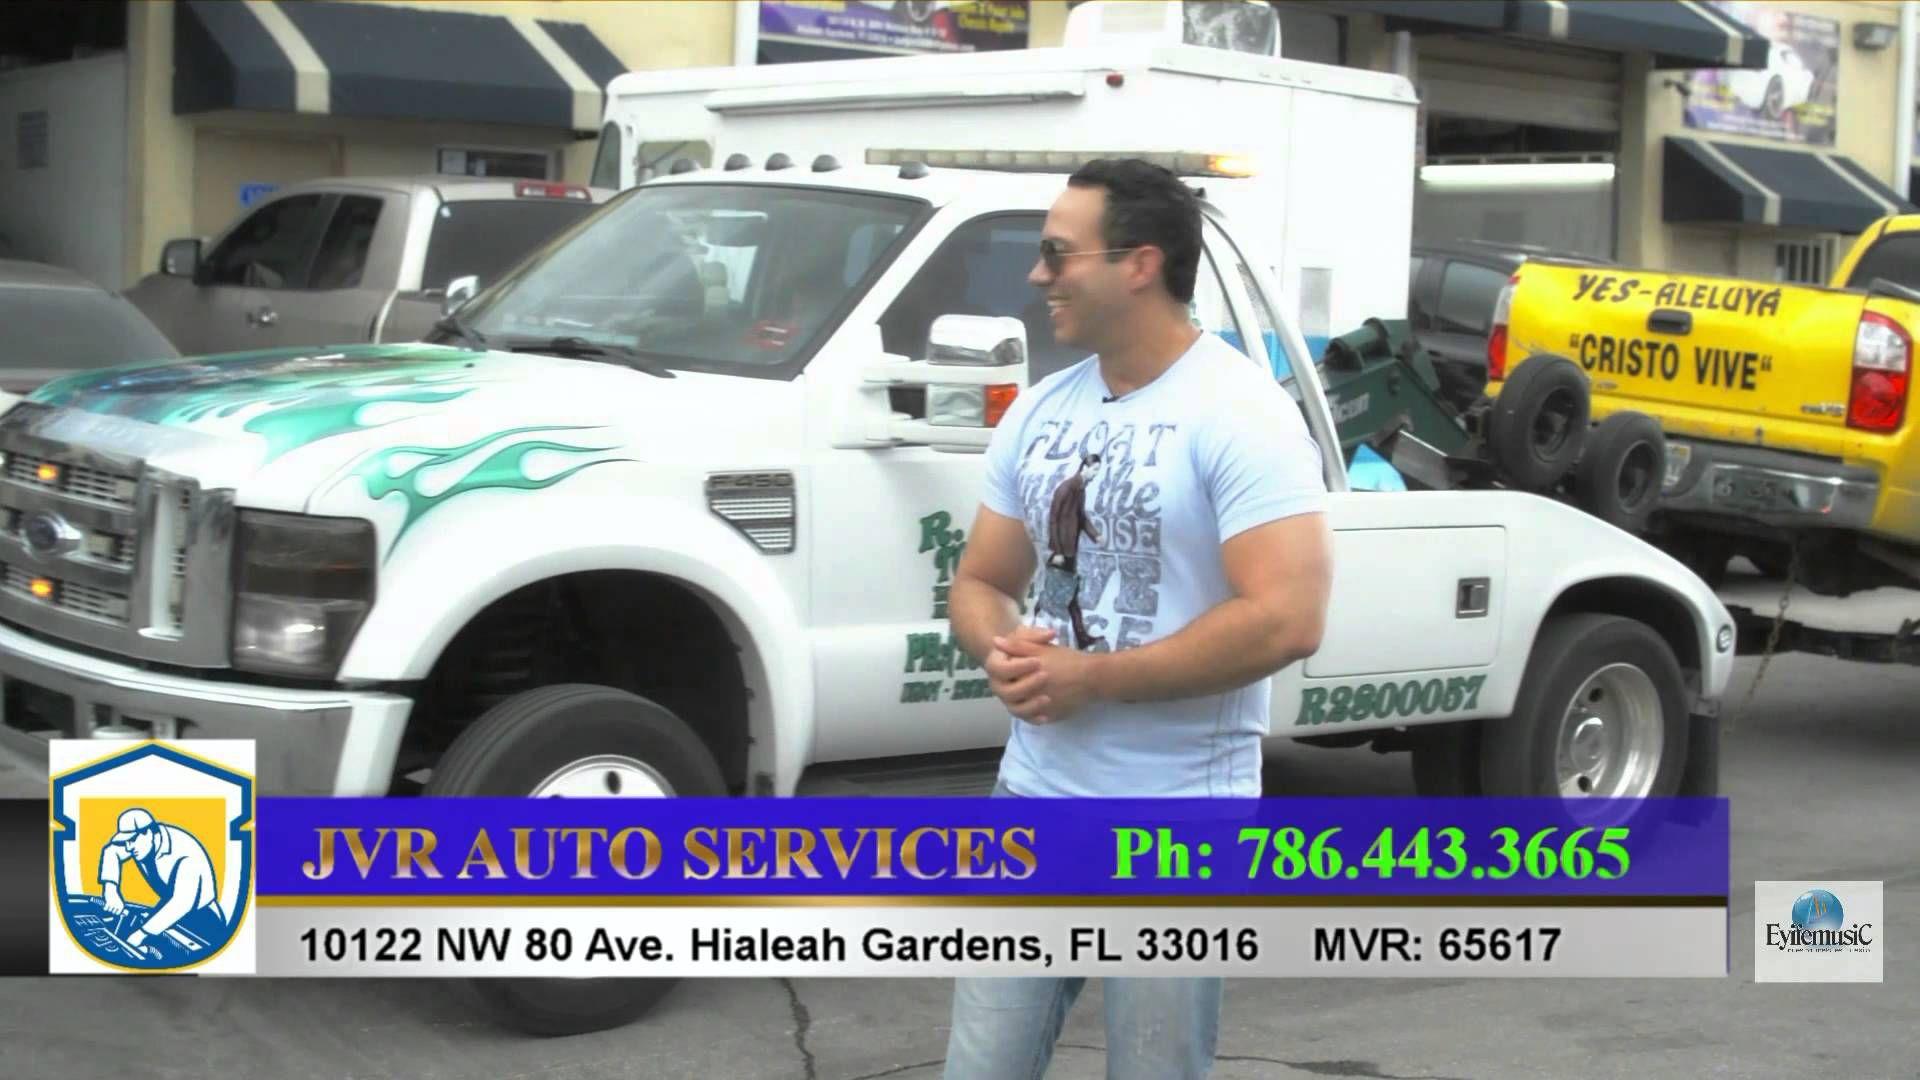 Jvr Auto Services 786 443 3665 Taller De Mecanica Para Autos